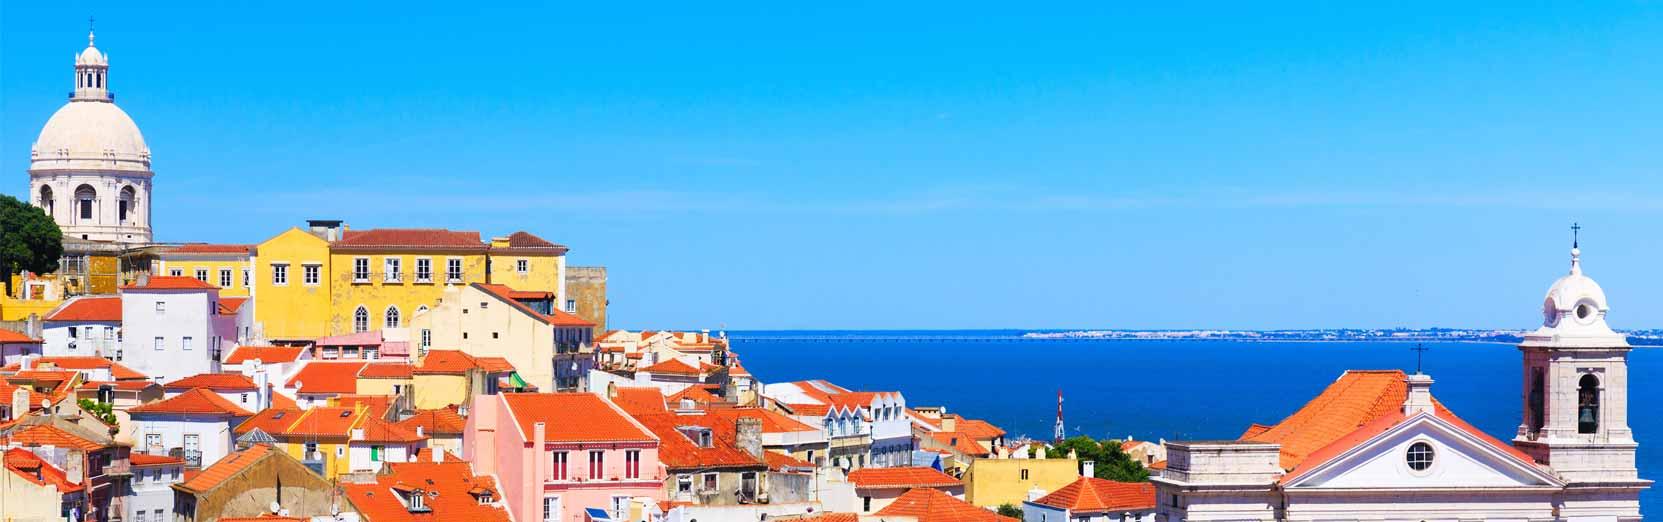 Autovermietung in Portugal - jetzt Auto mieten